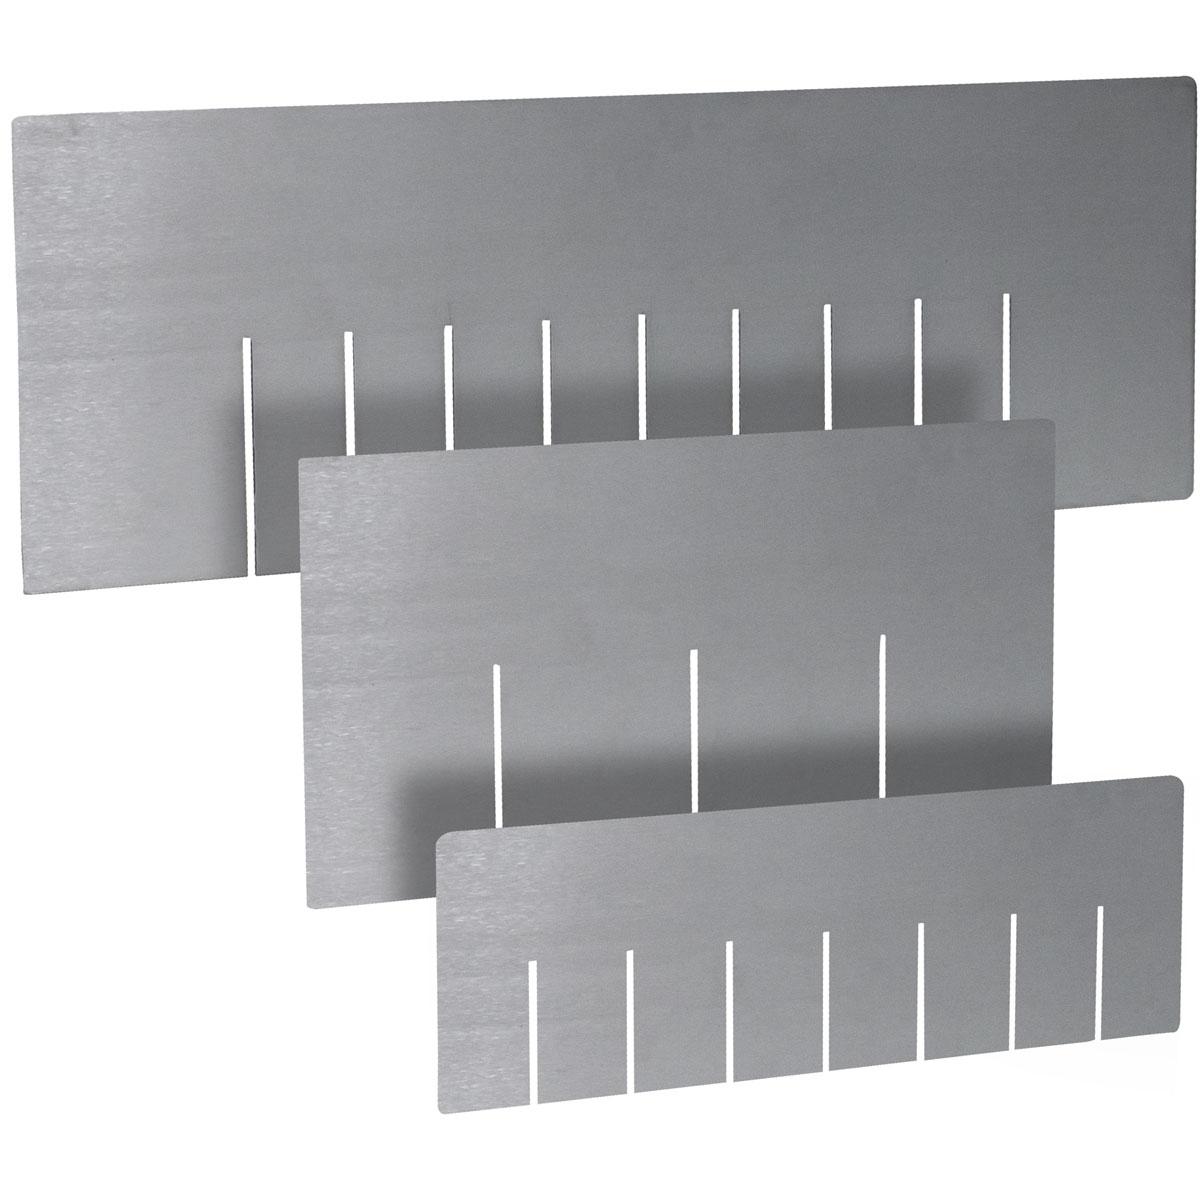 "Long Aluminum Divider15.38"" x 3.38""SKU: 521009"